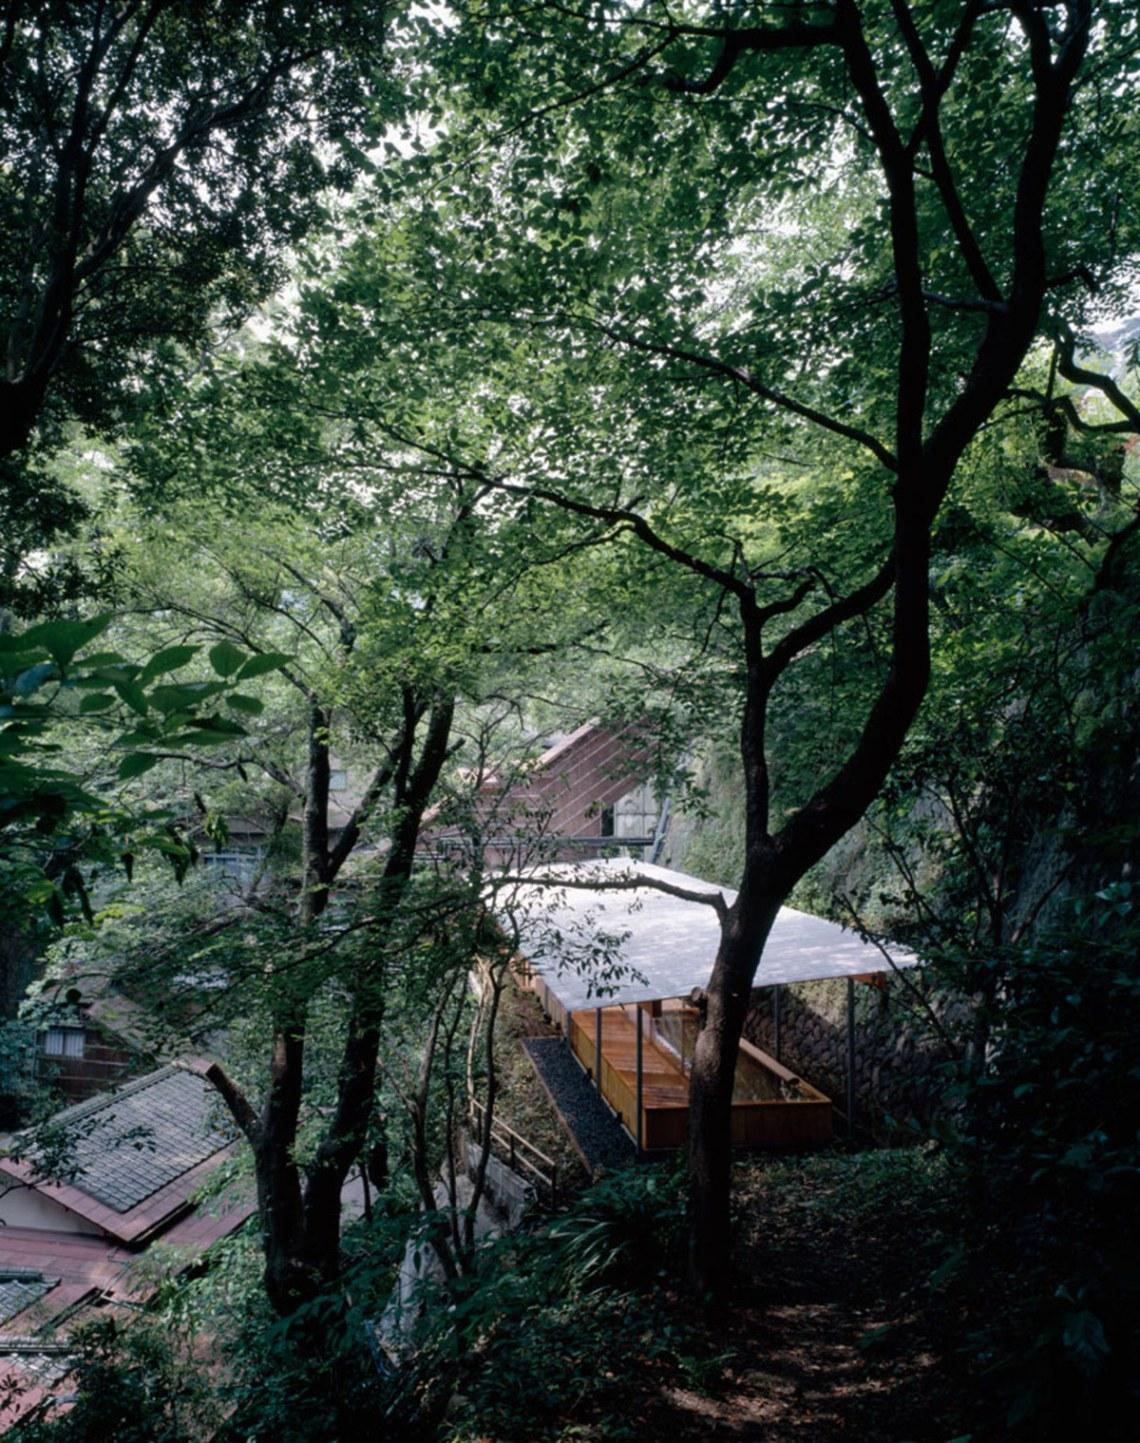 Horai-Onsen-Bath-House-kengo-kuma-1